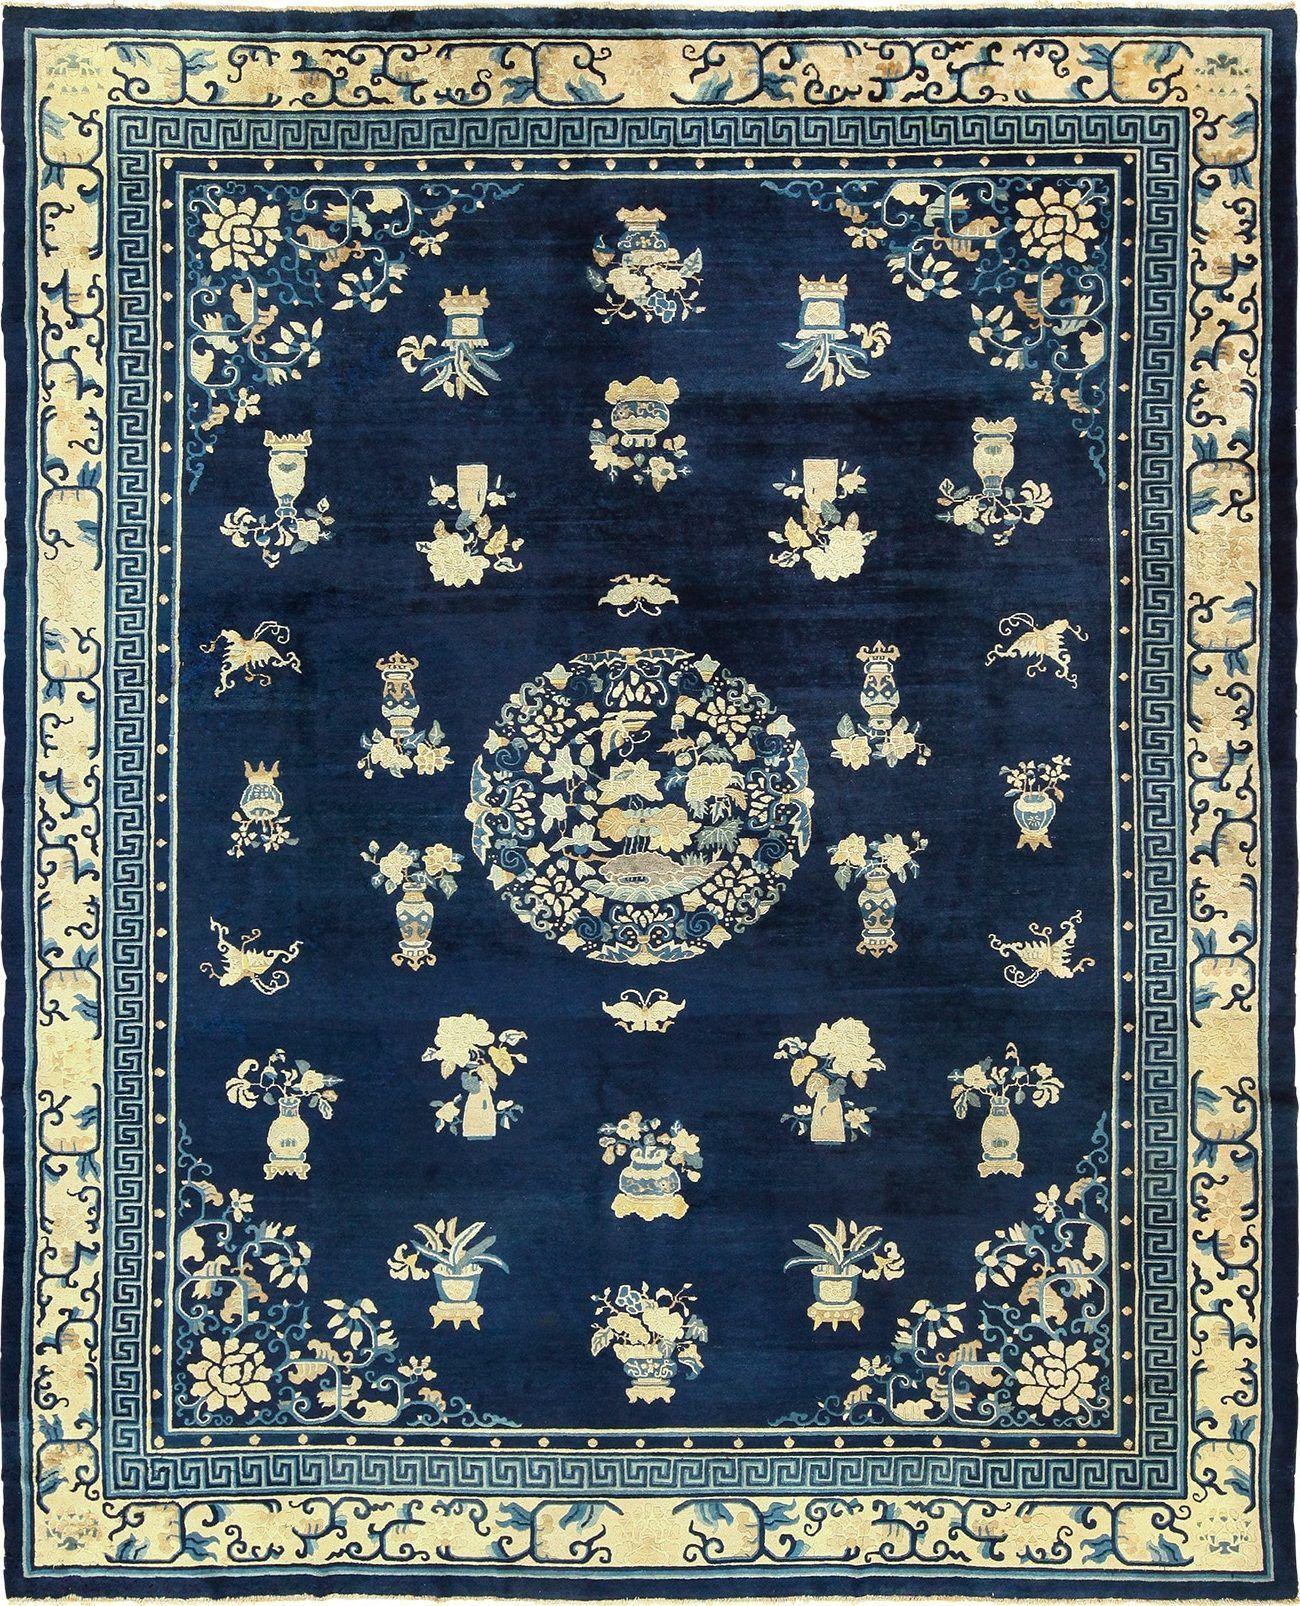 Chinese Blue And White Antique Peking Rug 49474 Nazmiyal Chinese Rug Antiques Rugs